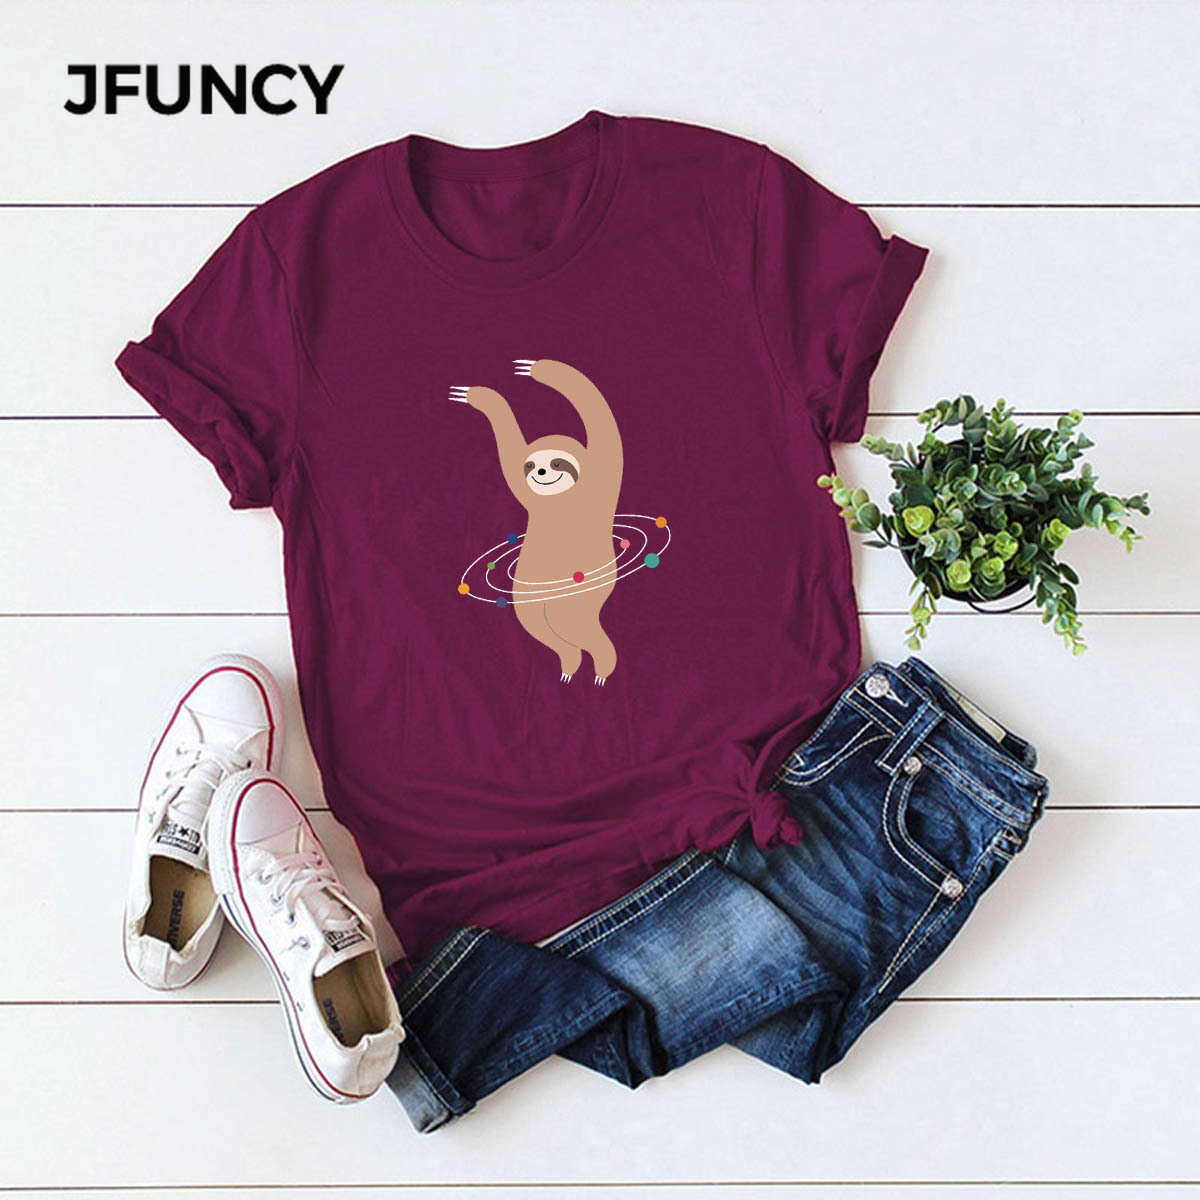 JFUNCY Plus Size S-5XL Summer Cotton T Shirt Women Casual Tops Tees Lovely Dancing Sloth Cartoon Print Shirts Pink Women TShirt